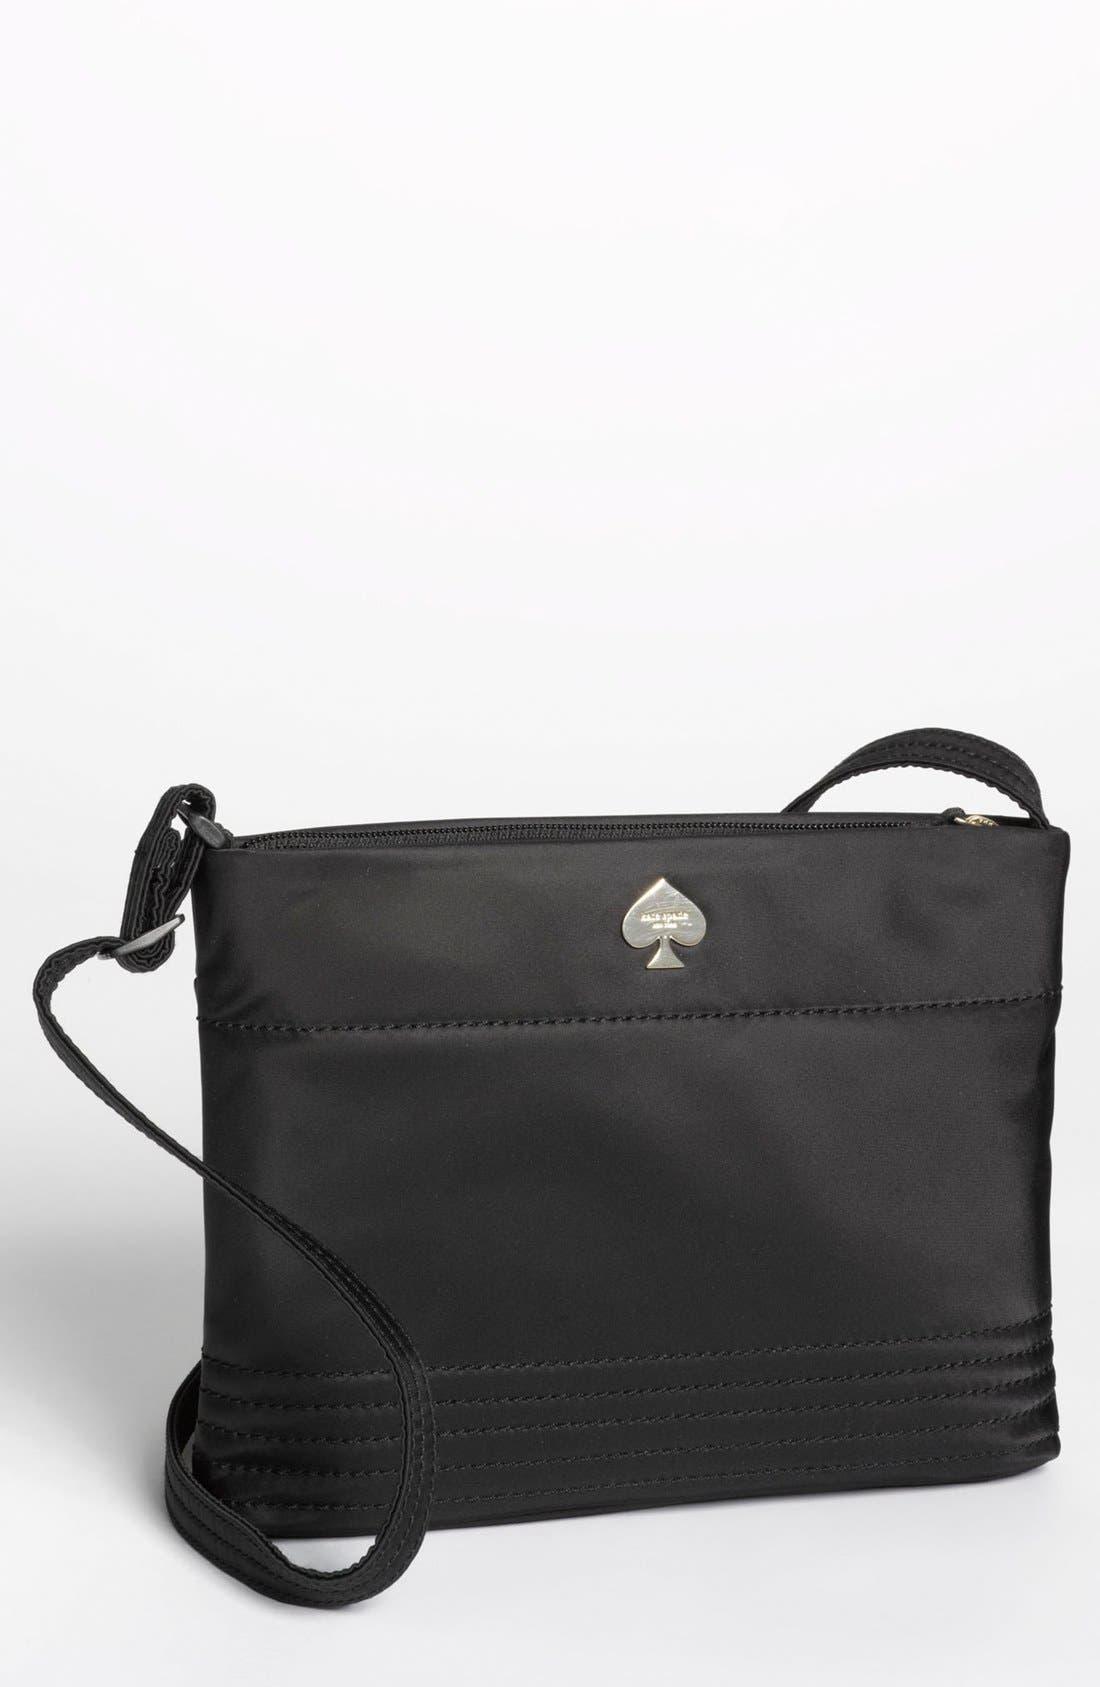 Alternate Image 1 Selected - kate spade new york 'flatiron - cammy' crossbody bag